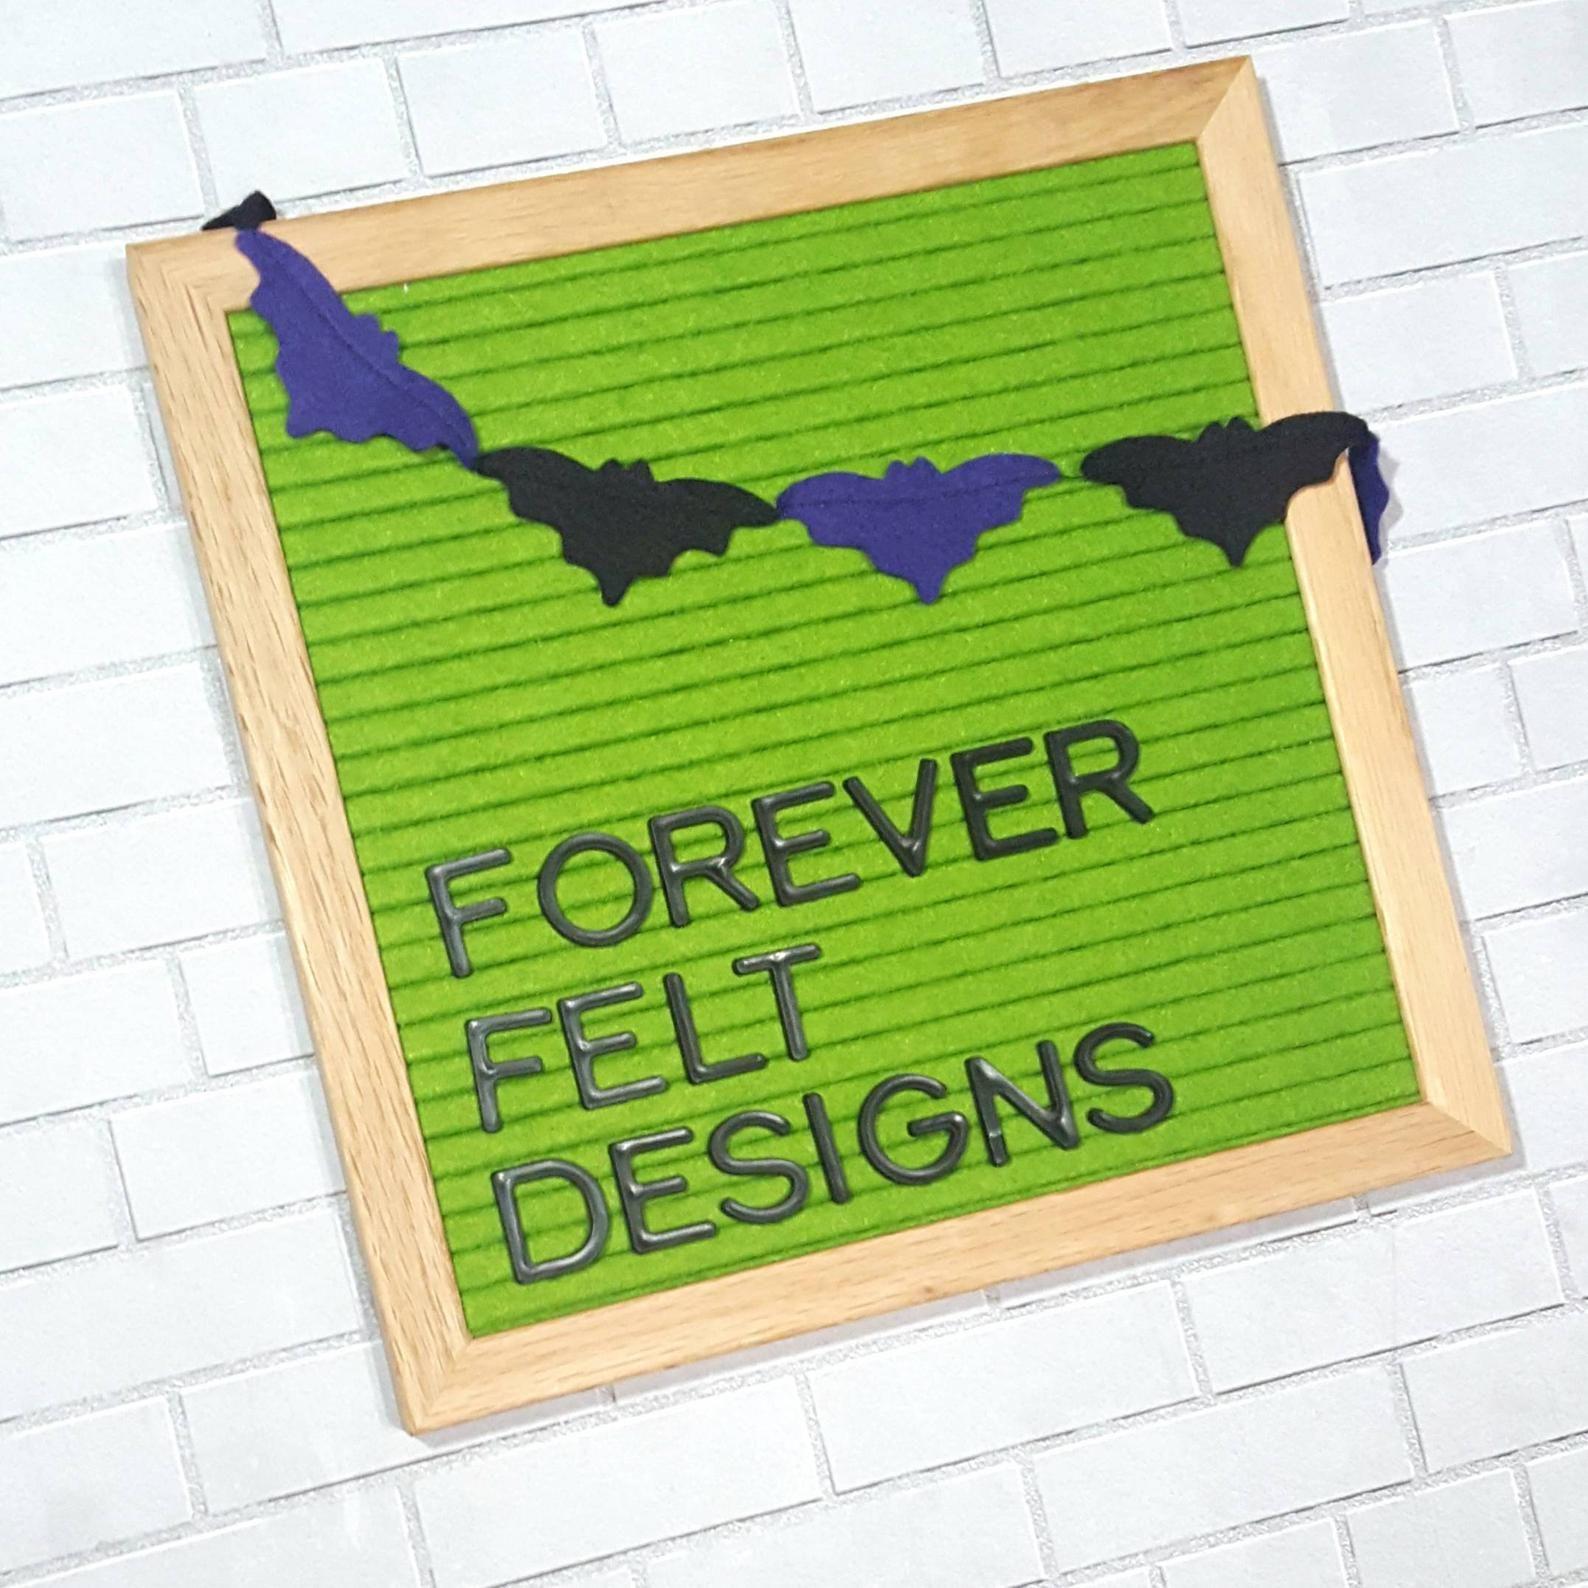 Letterboard garland, Halloween garland, letterboard